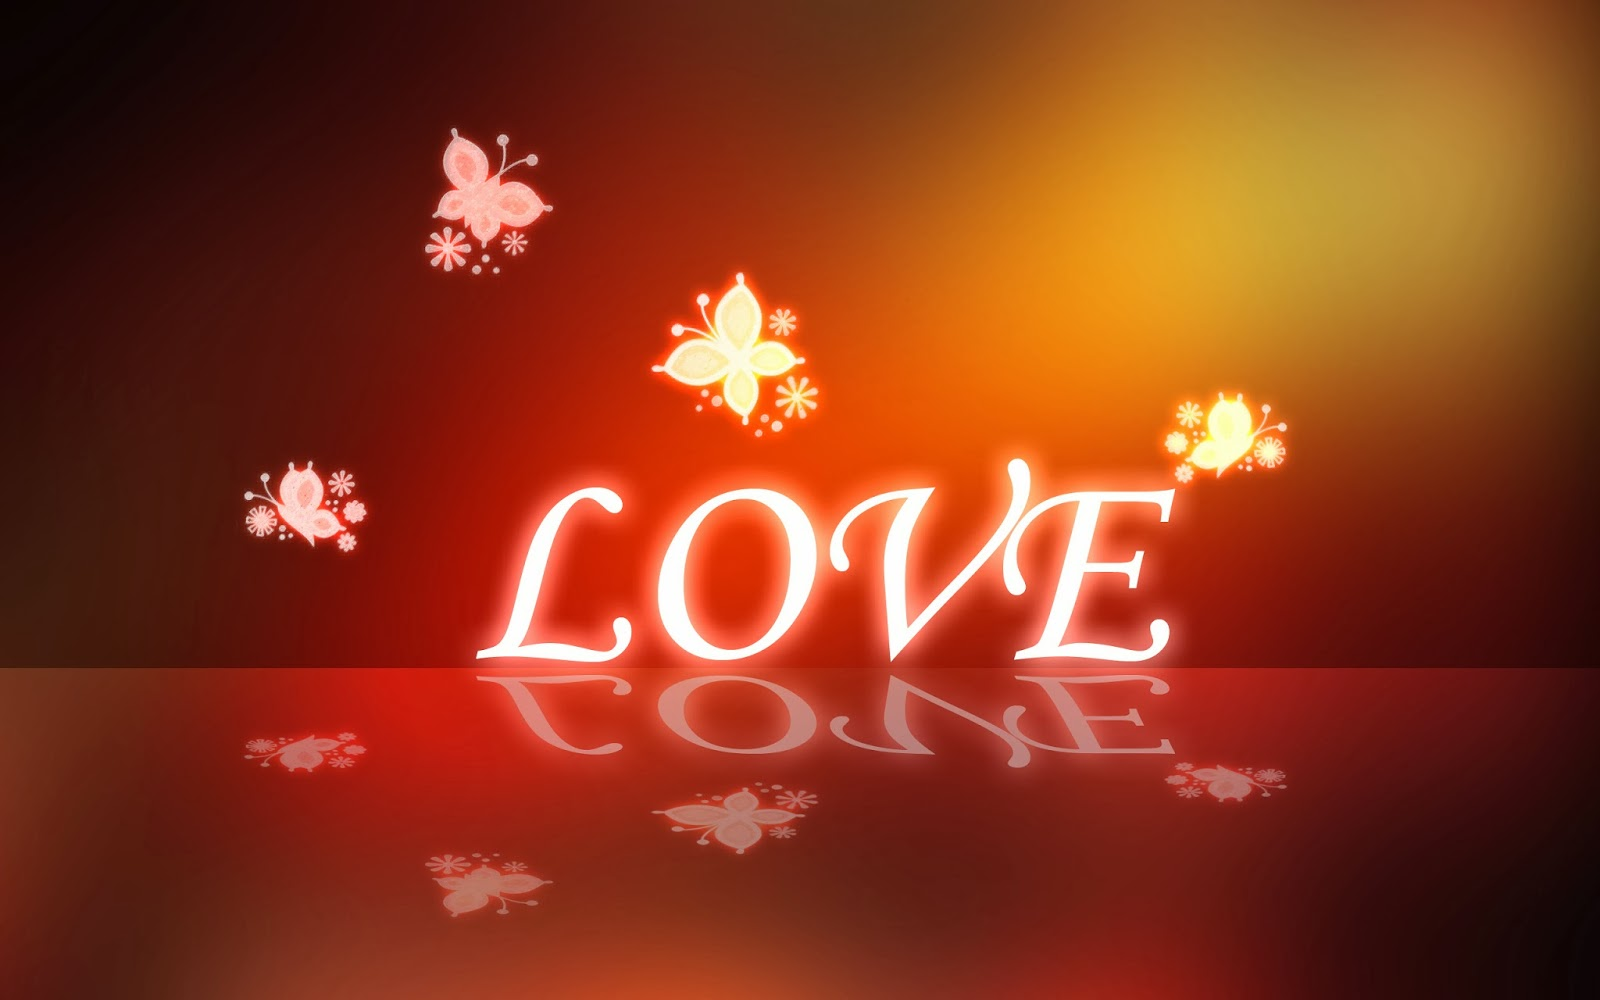 3d Love Images Hd 15 Free Wallpaper: Hot Girl Wallpaper: 3d Love Hd Wallpapers Free Download